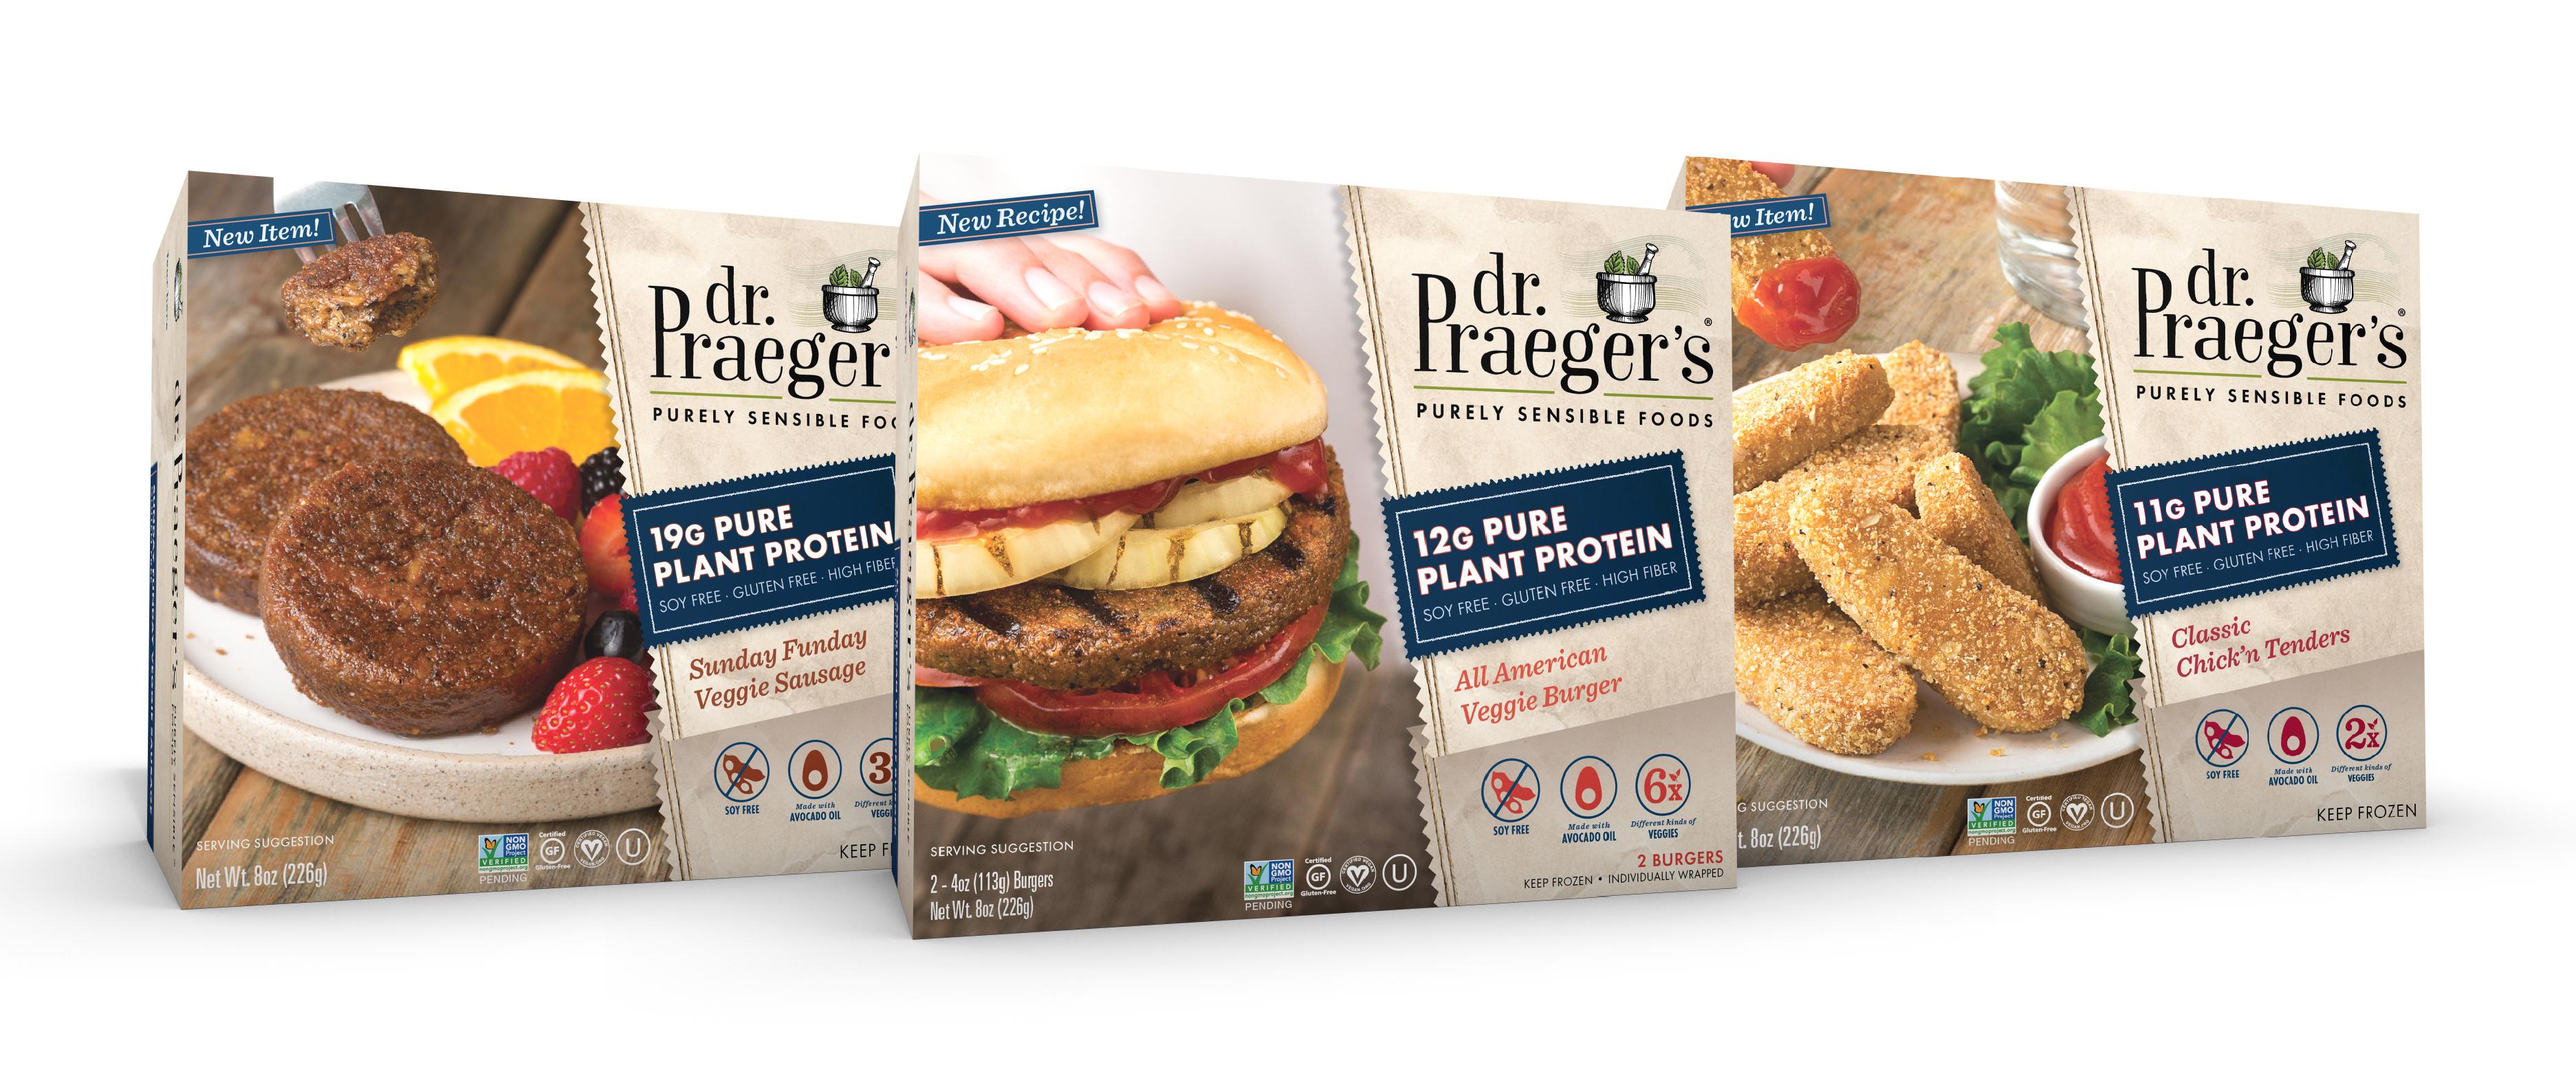 Dr. Praeger's Pure Plant Protein